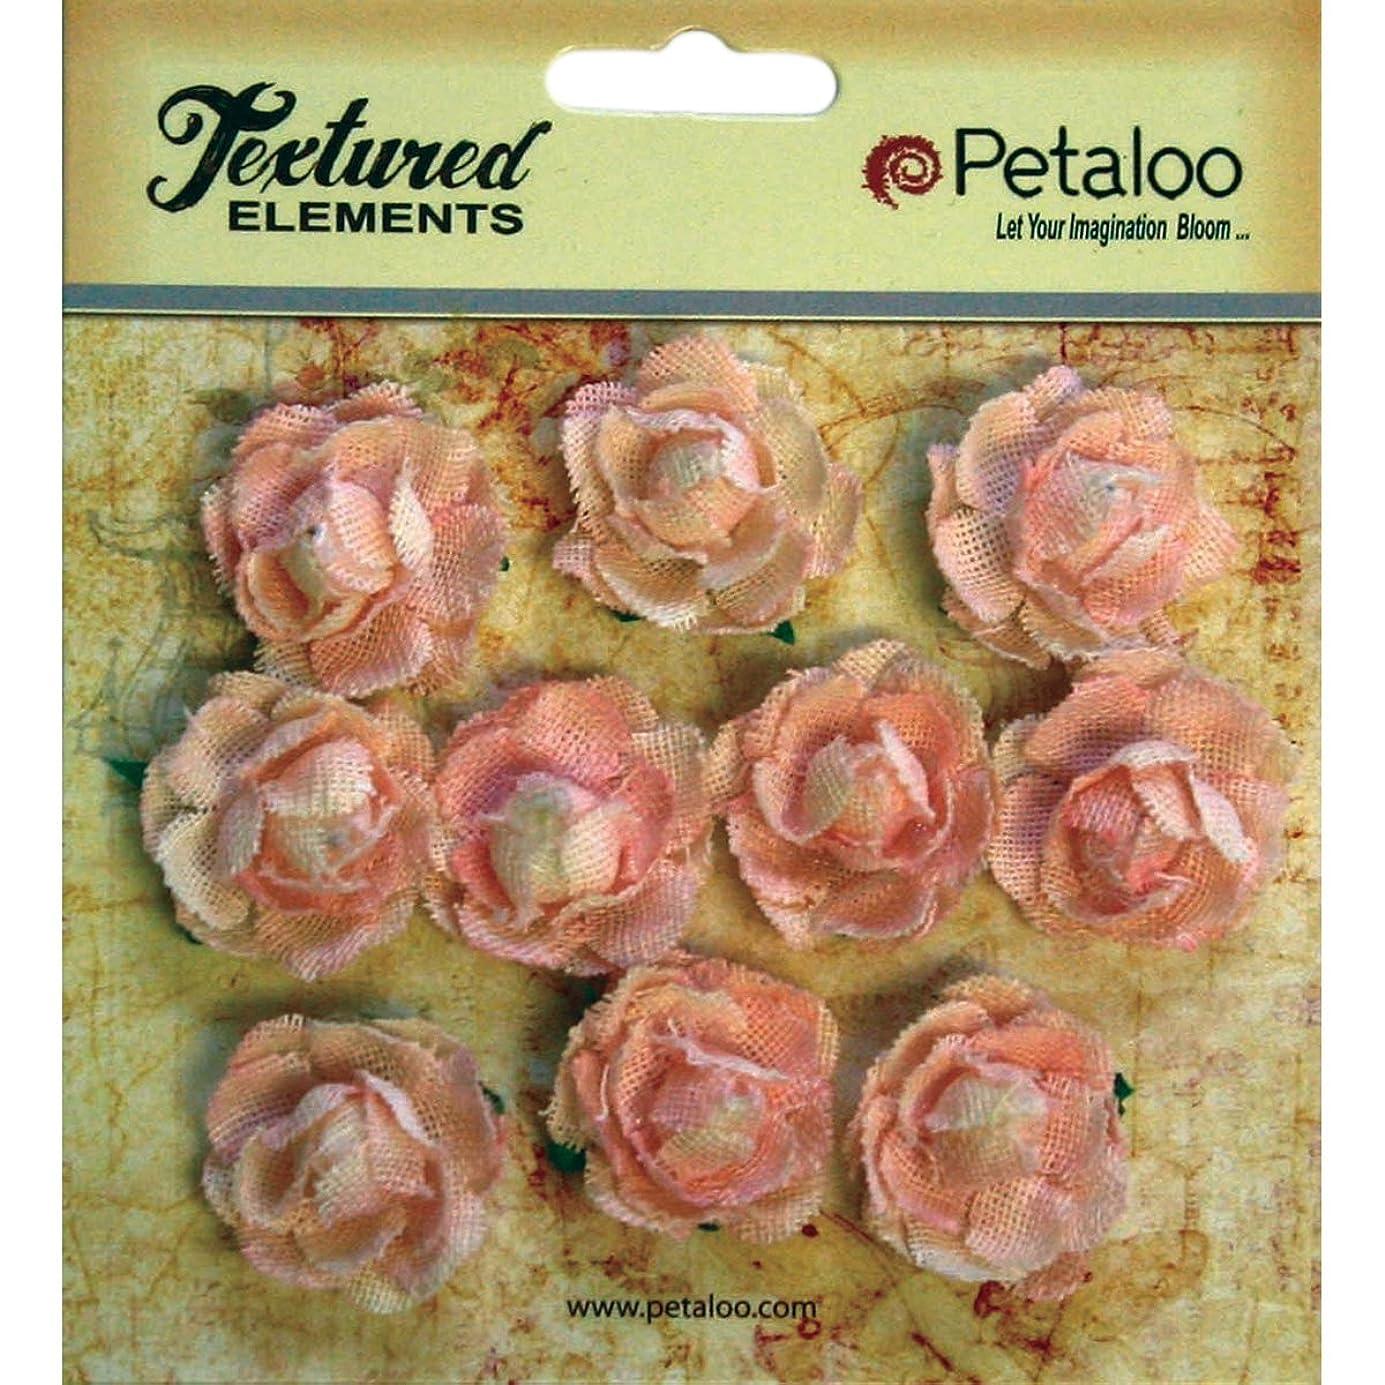 PETALOO Textured Elements Mini Canvas Rosettes (10 Pack), 1